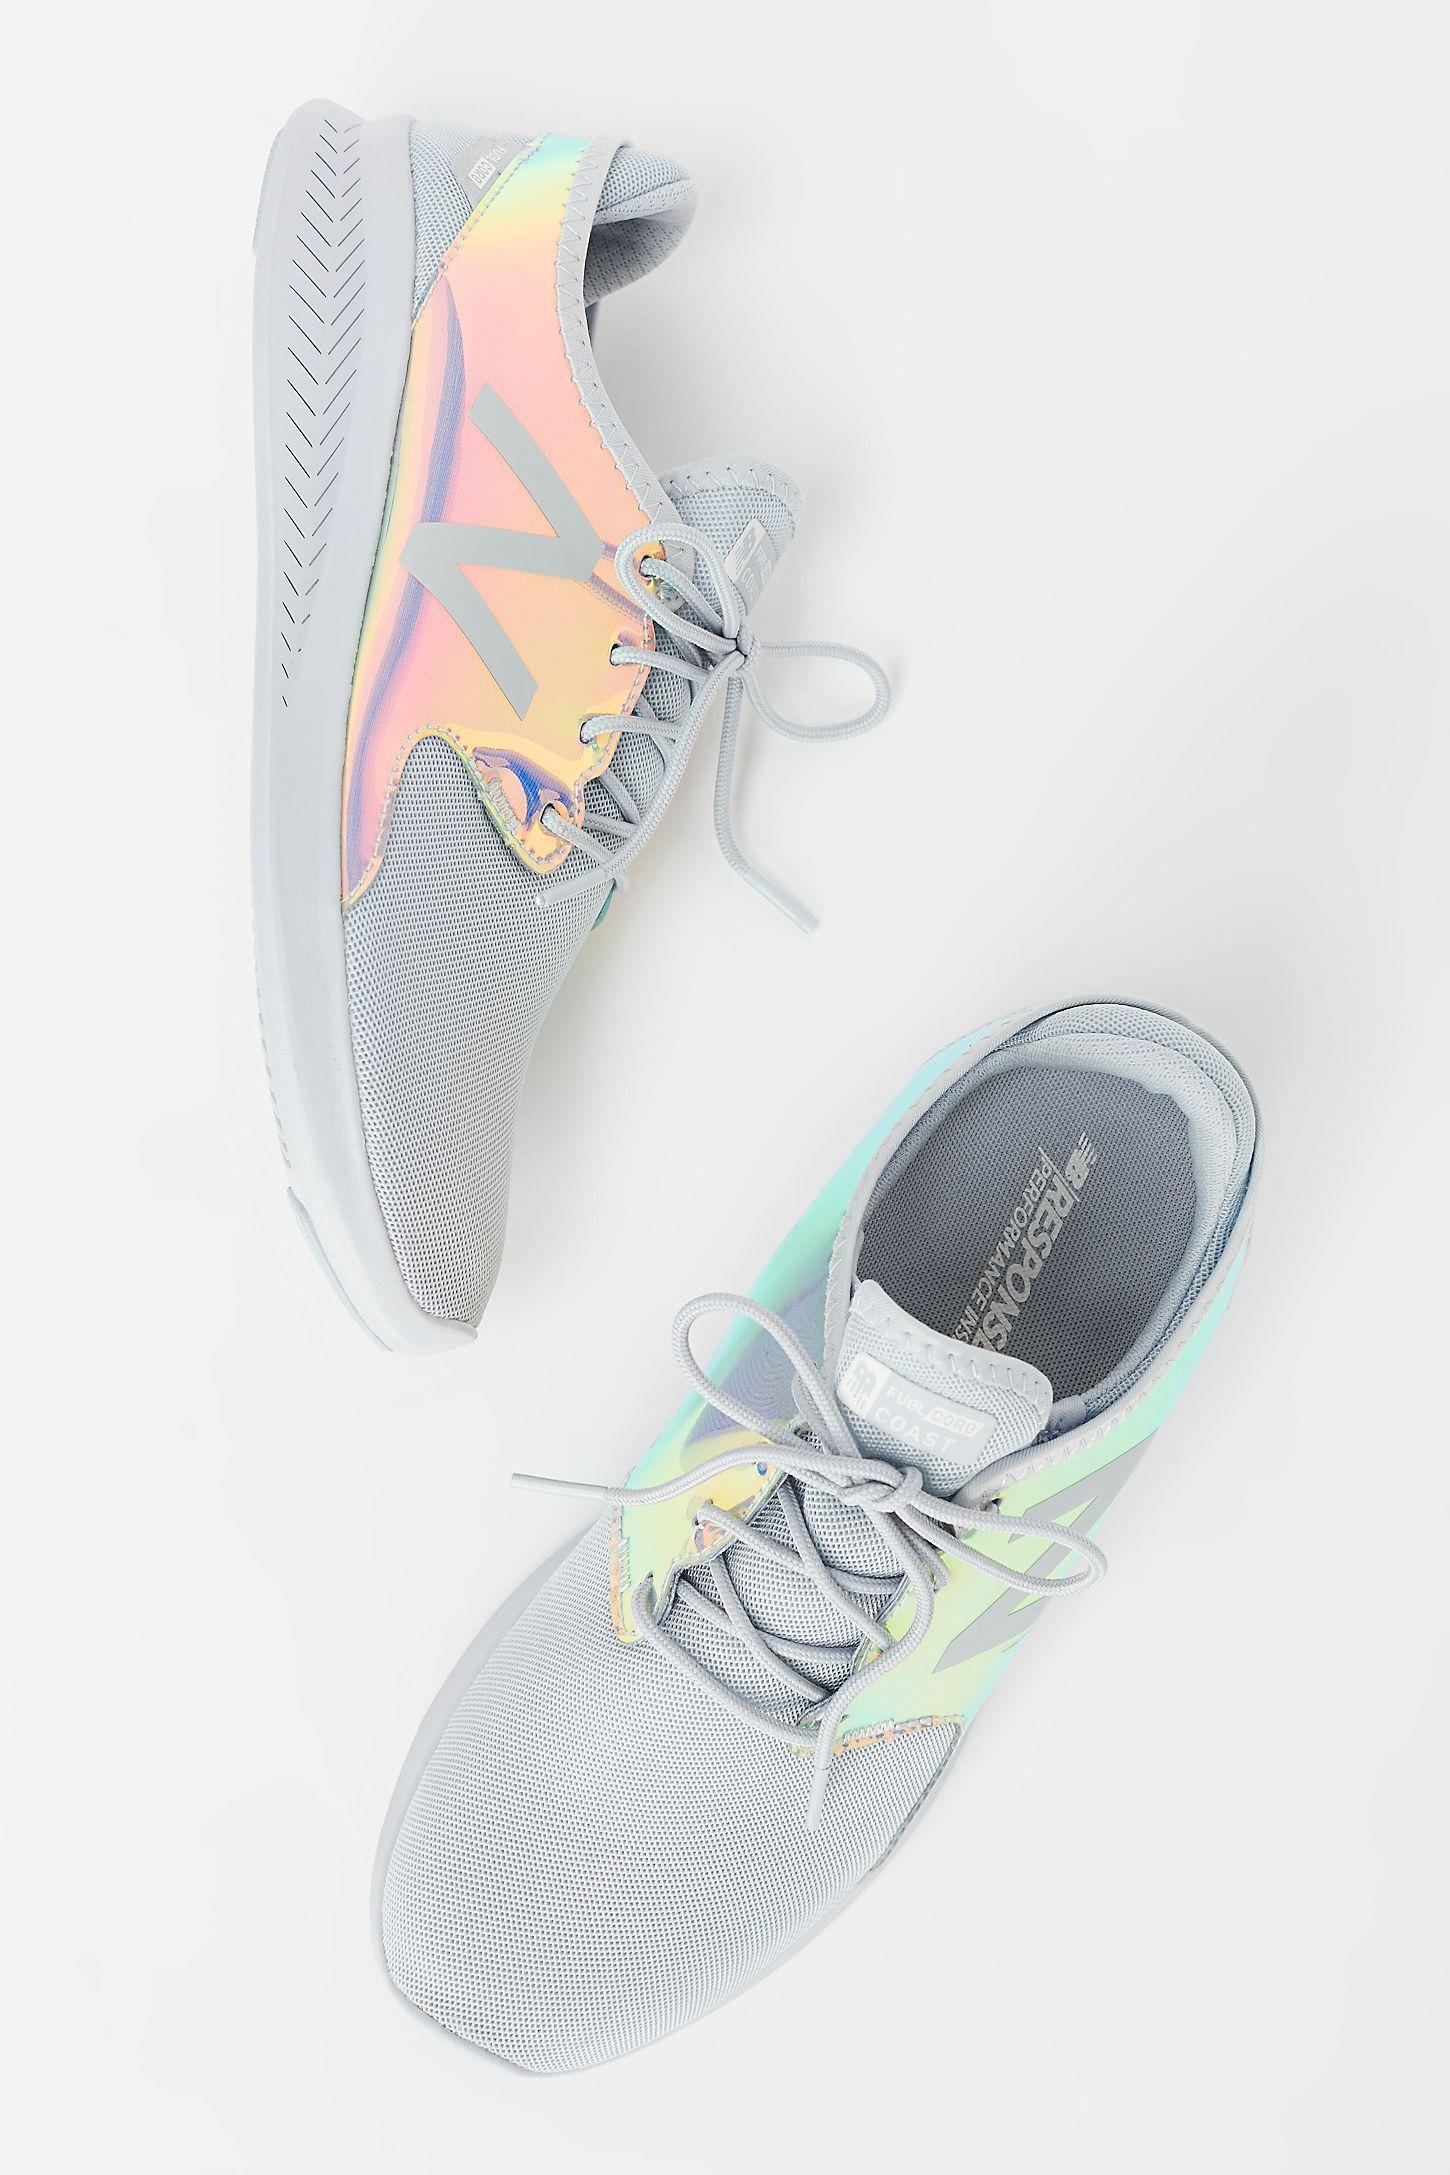 Running shoes sneakers, Sneakers